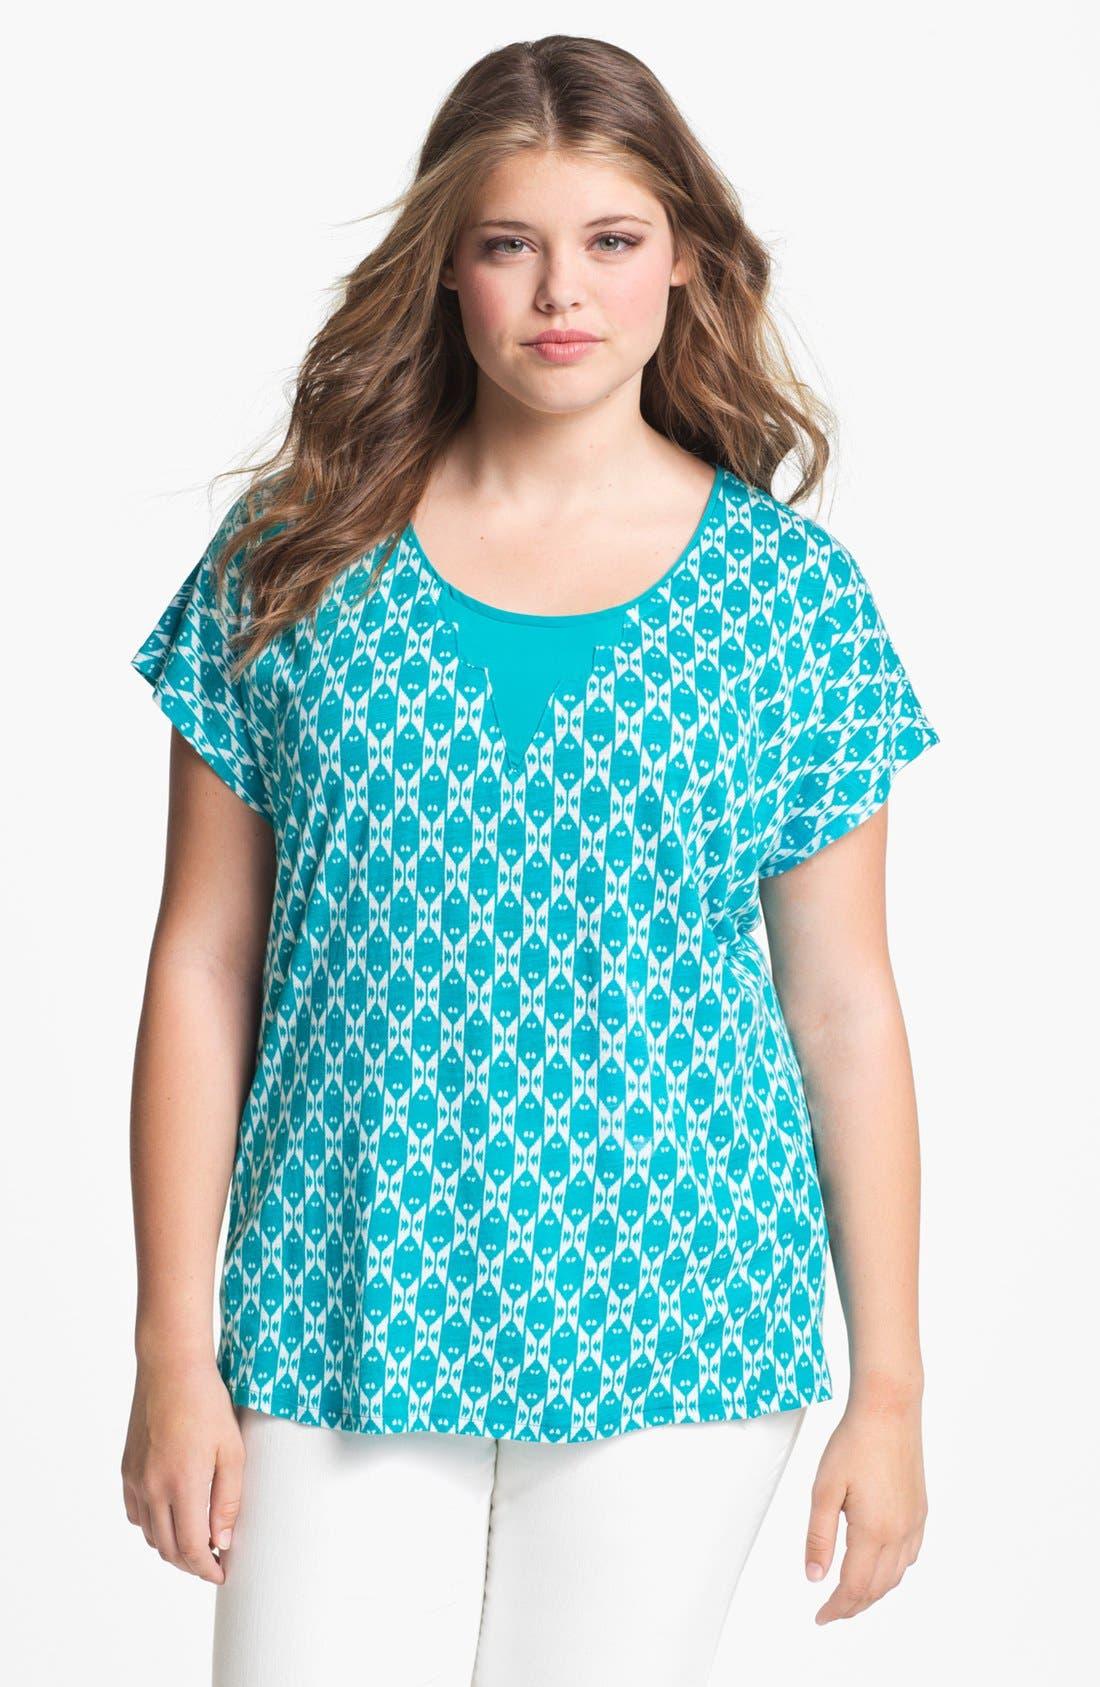 Alternate Image 1 Selected - Lucky Brand 'Carina' Ikat Print Top (Plus Size)